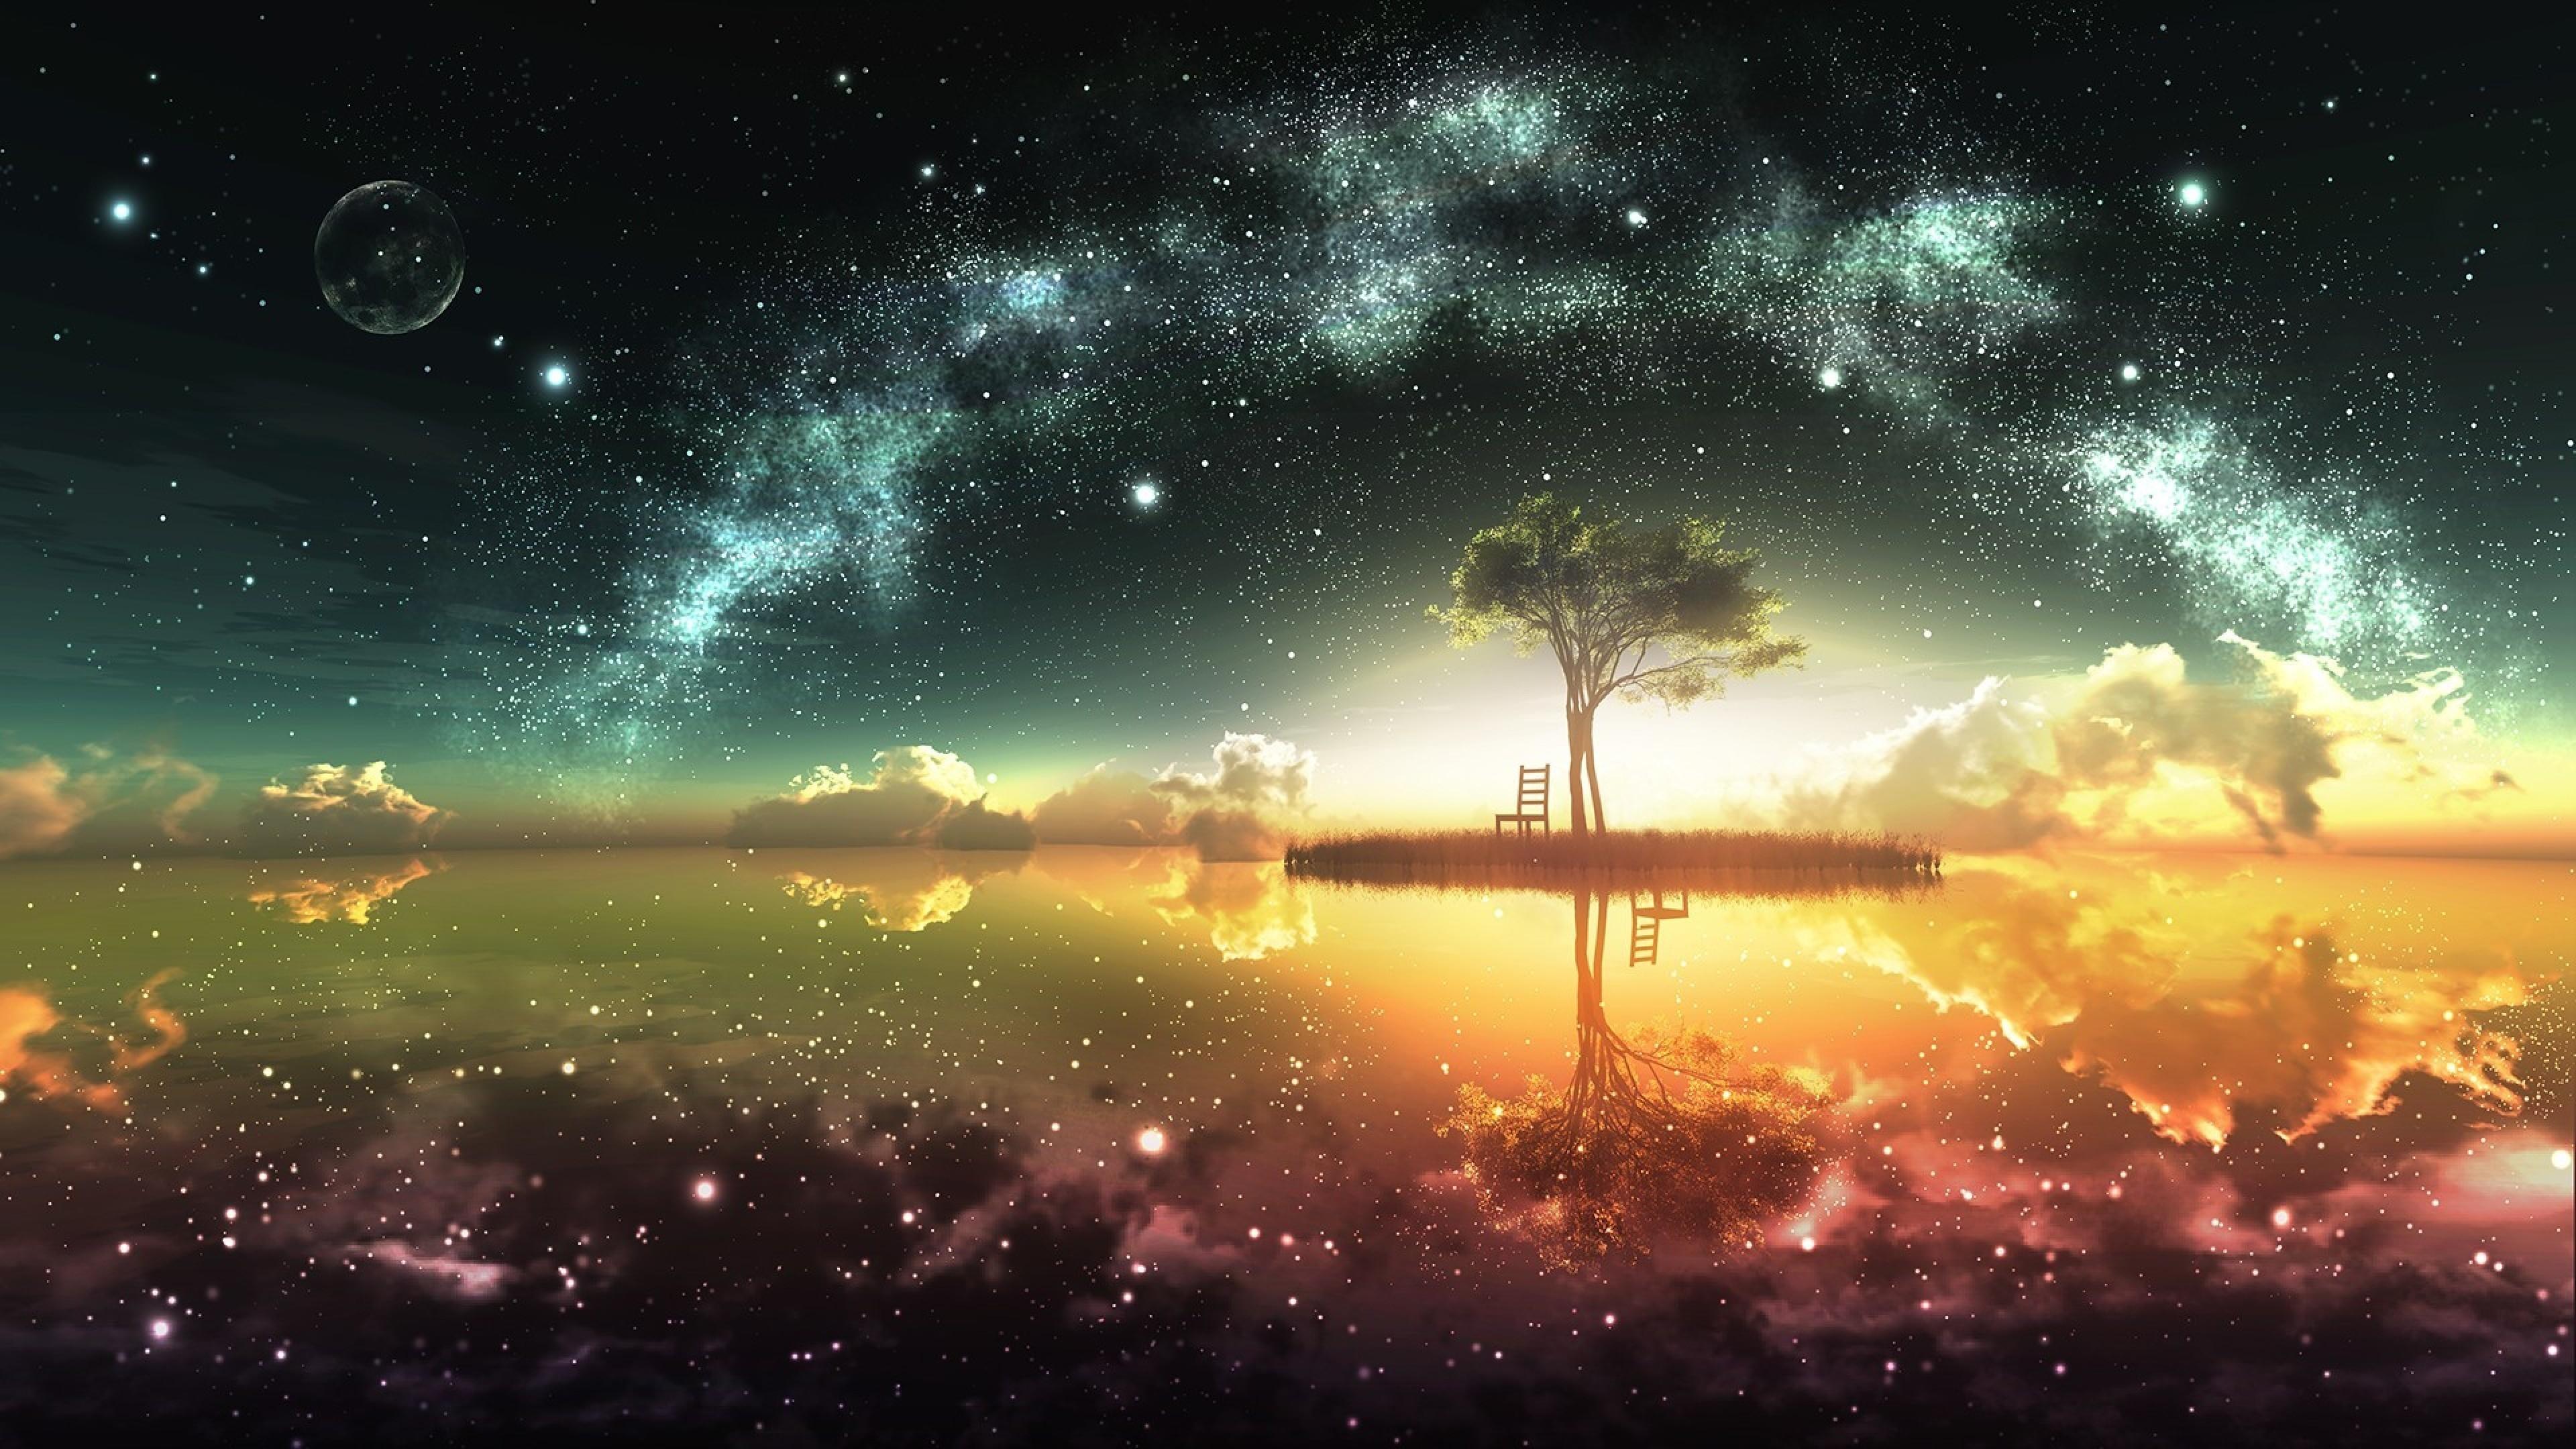 Wallpaper lake, sunset, trees, landscape, beach, art, night,  reflection | Landscape | Pinterest | Beach art, Lakes and Landscaping